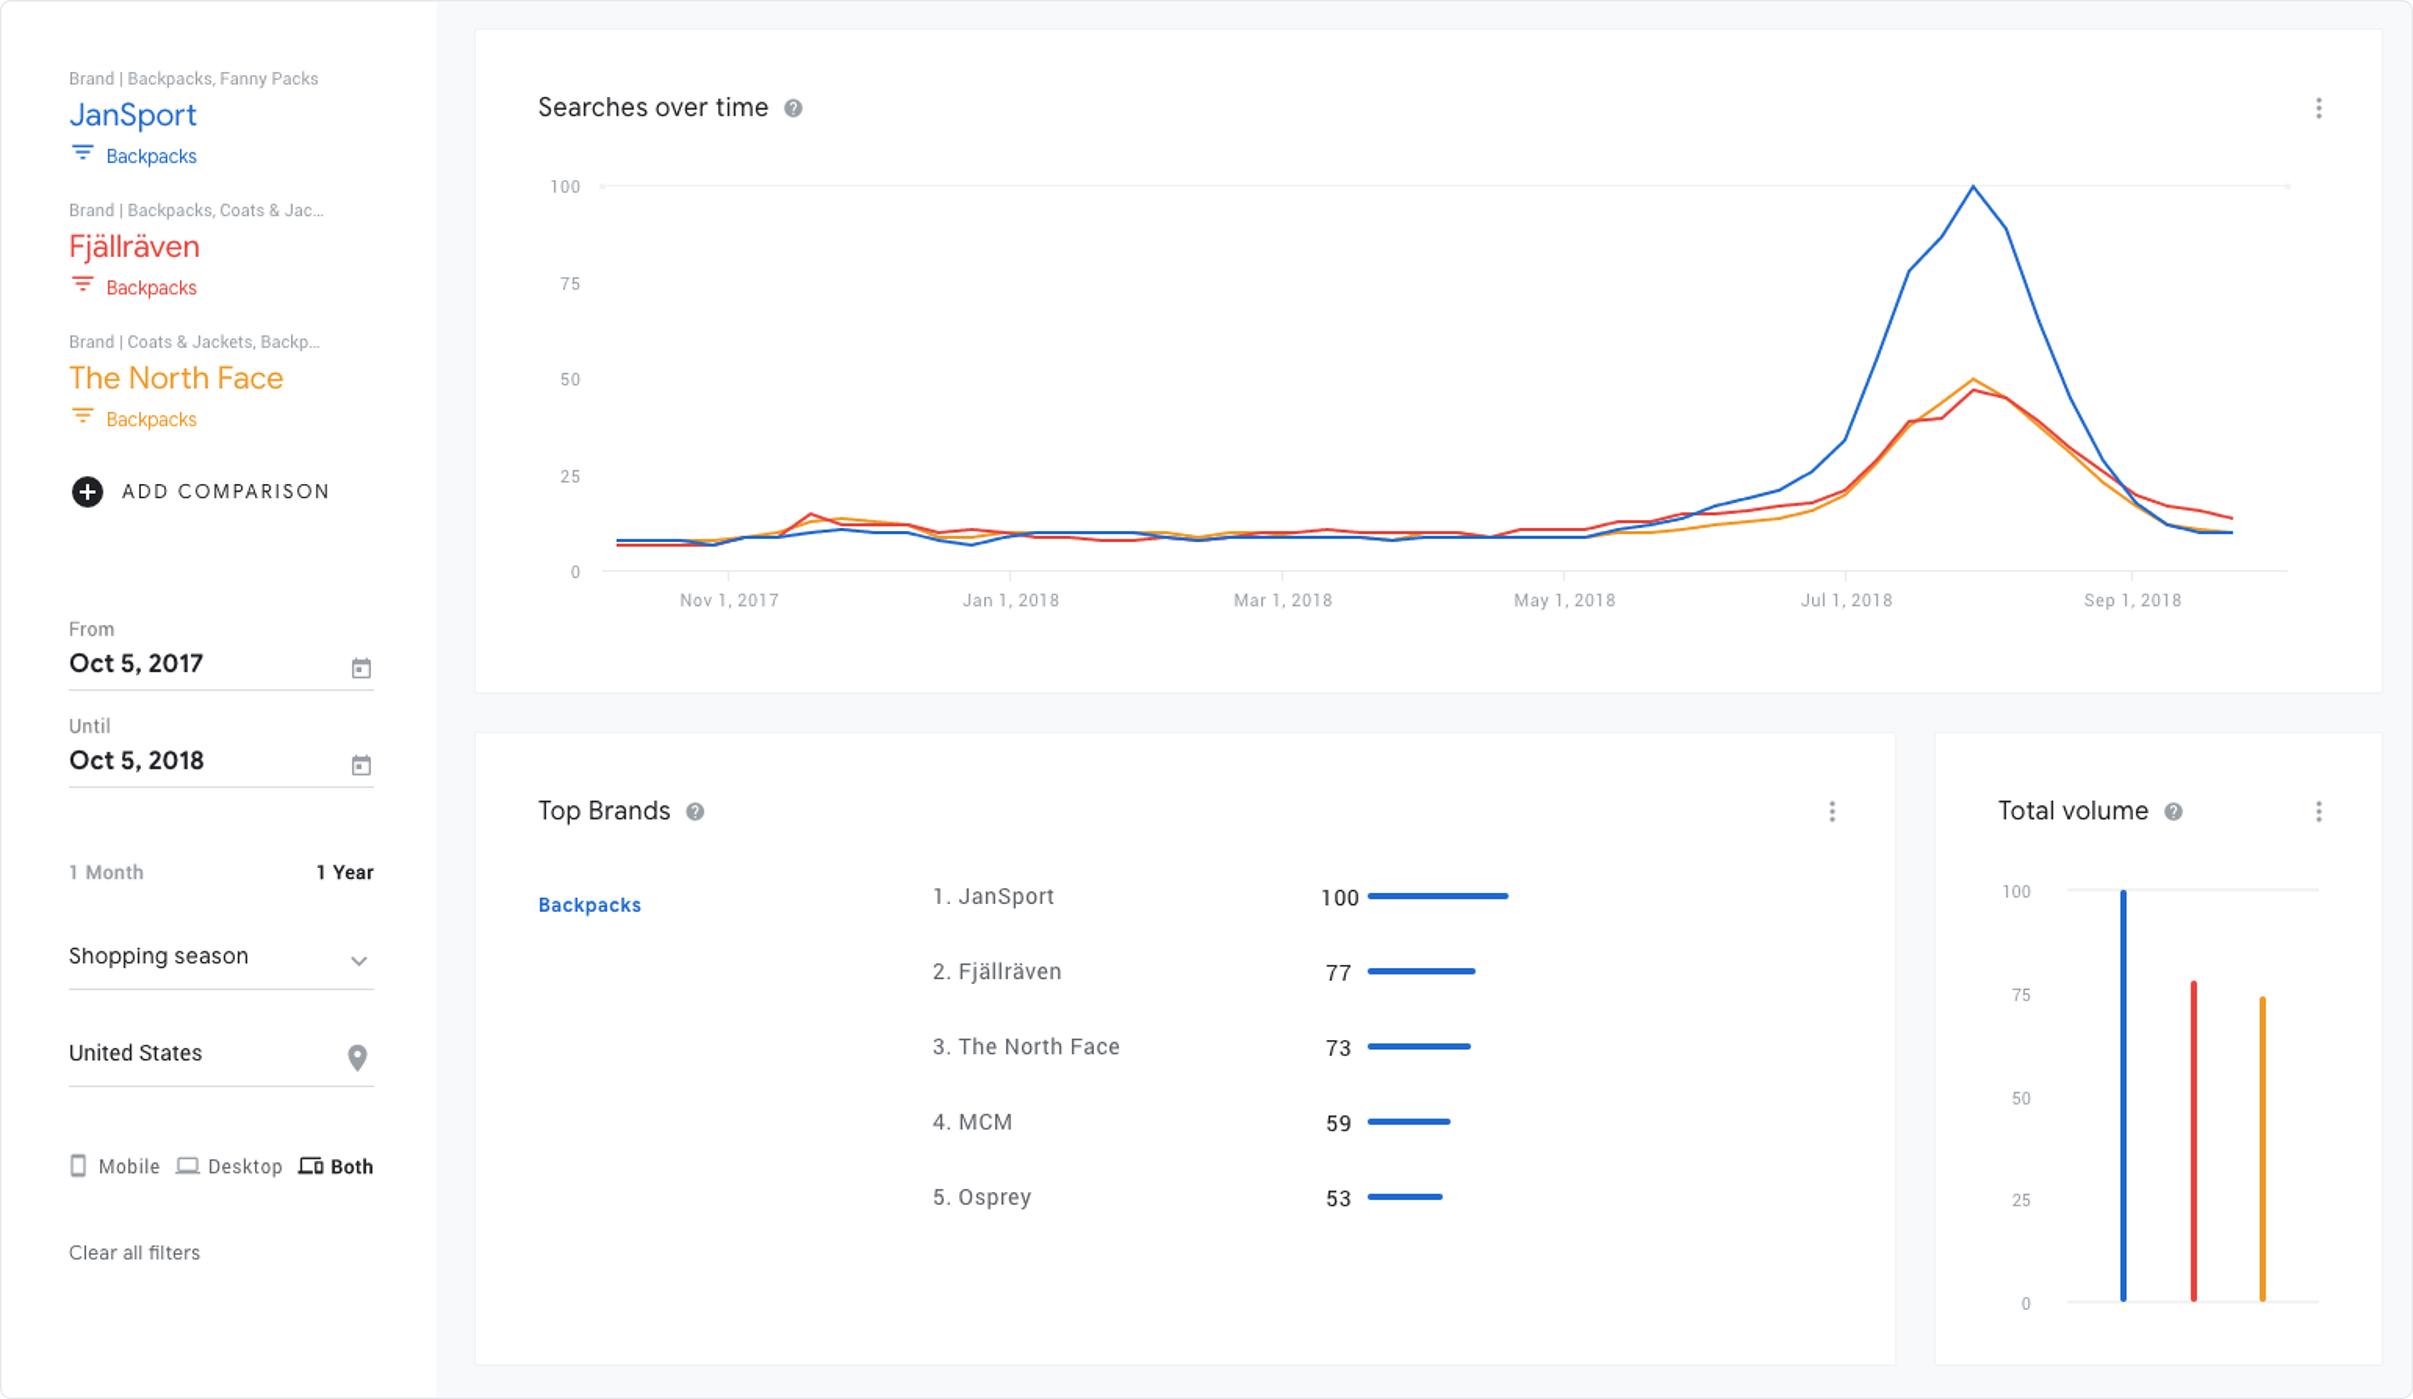 Brand popularity